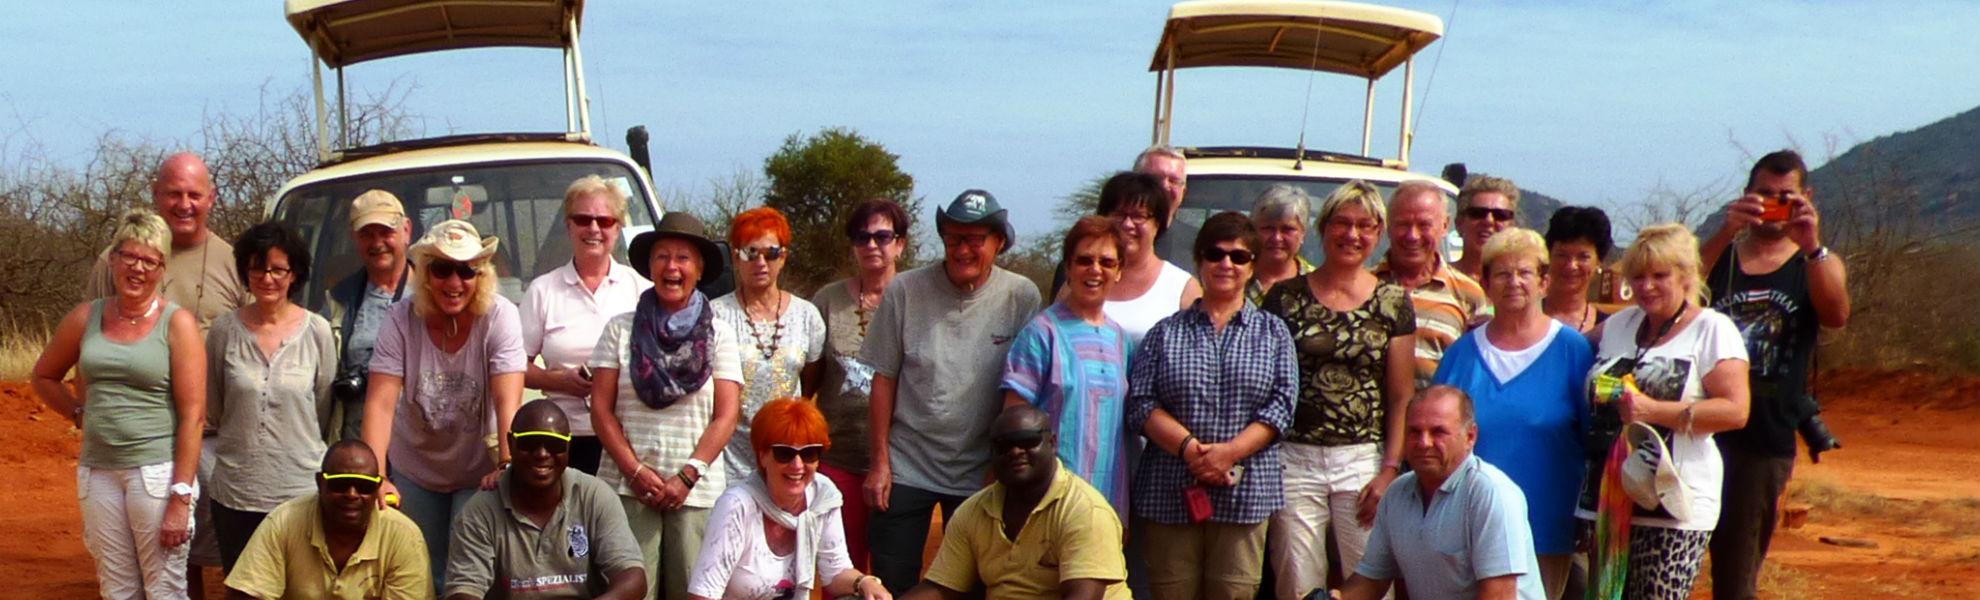 Sicherheit in Kenia - Reisekontor Schmidt Reisegruppe